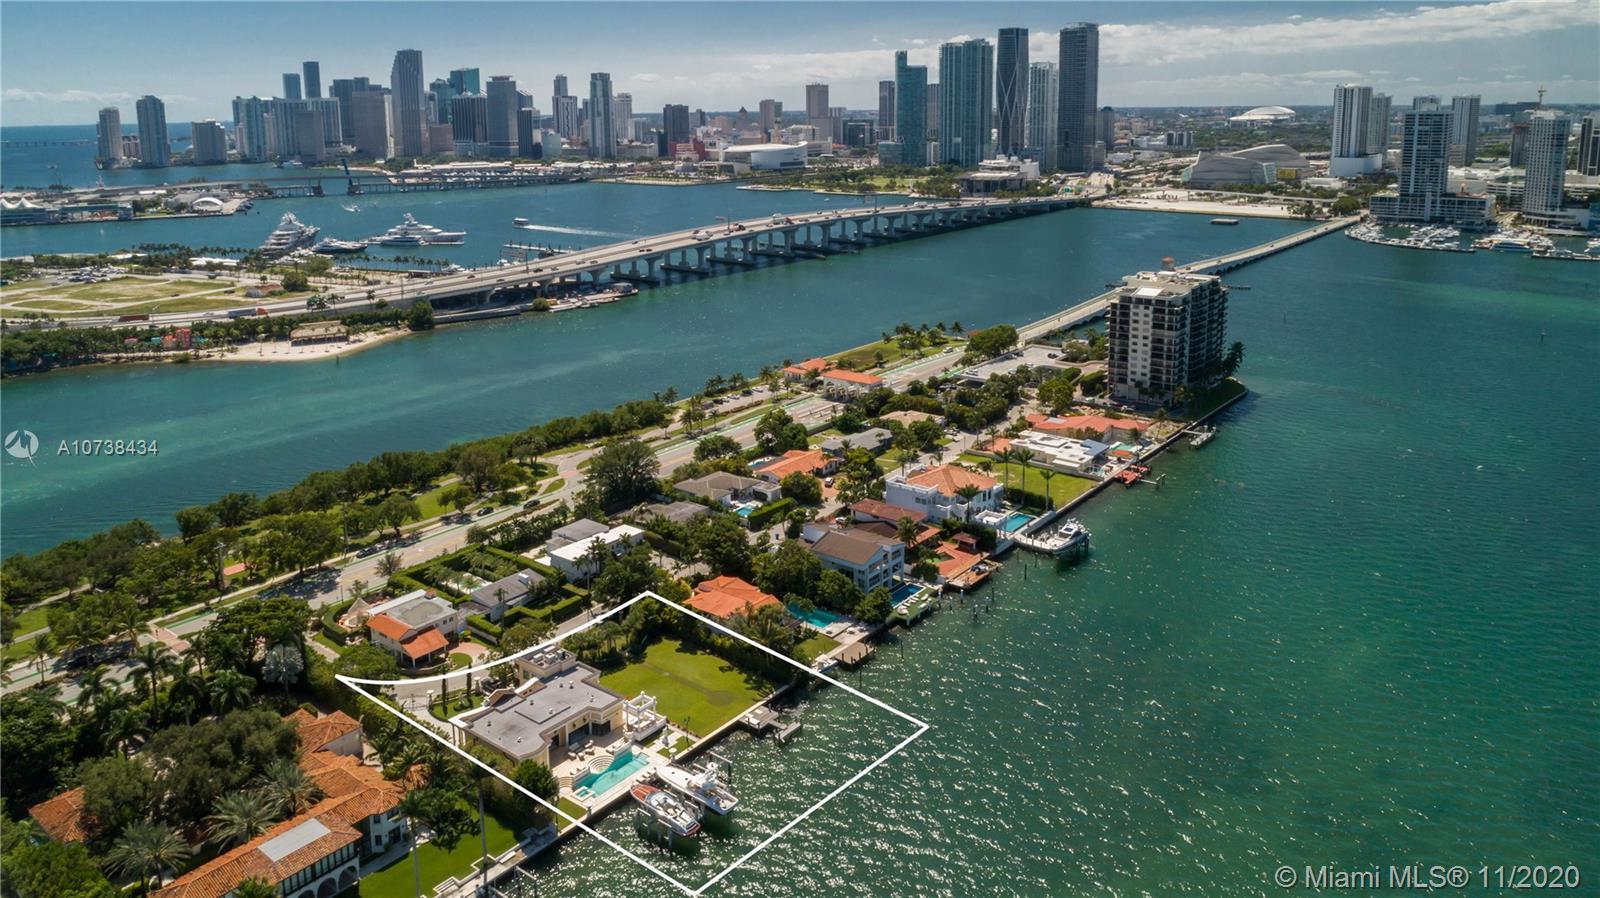 921 N Venetian Dr, Miami, FL 33139